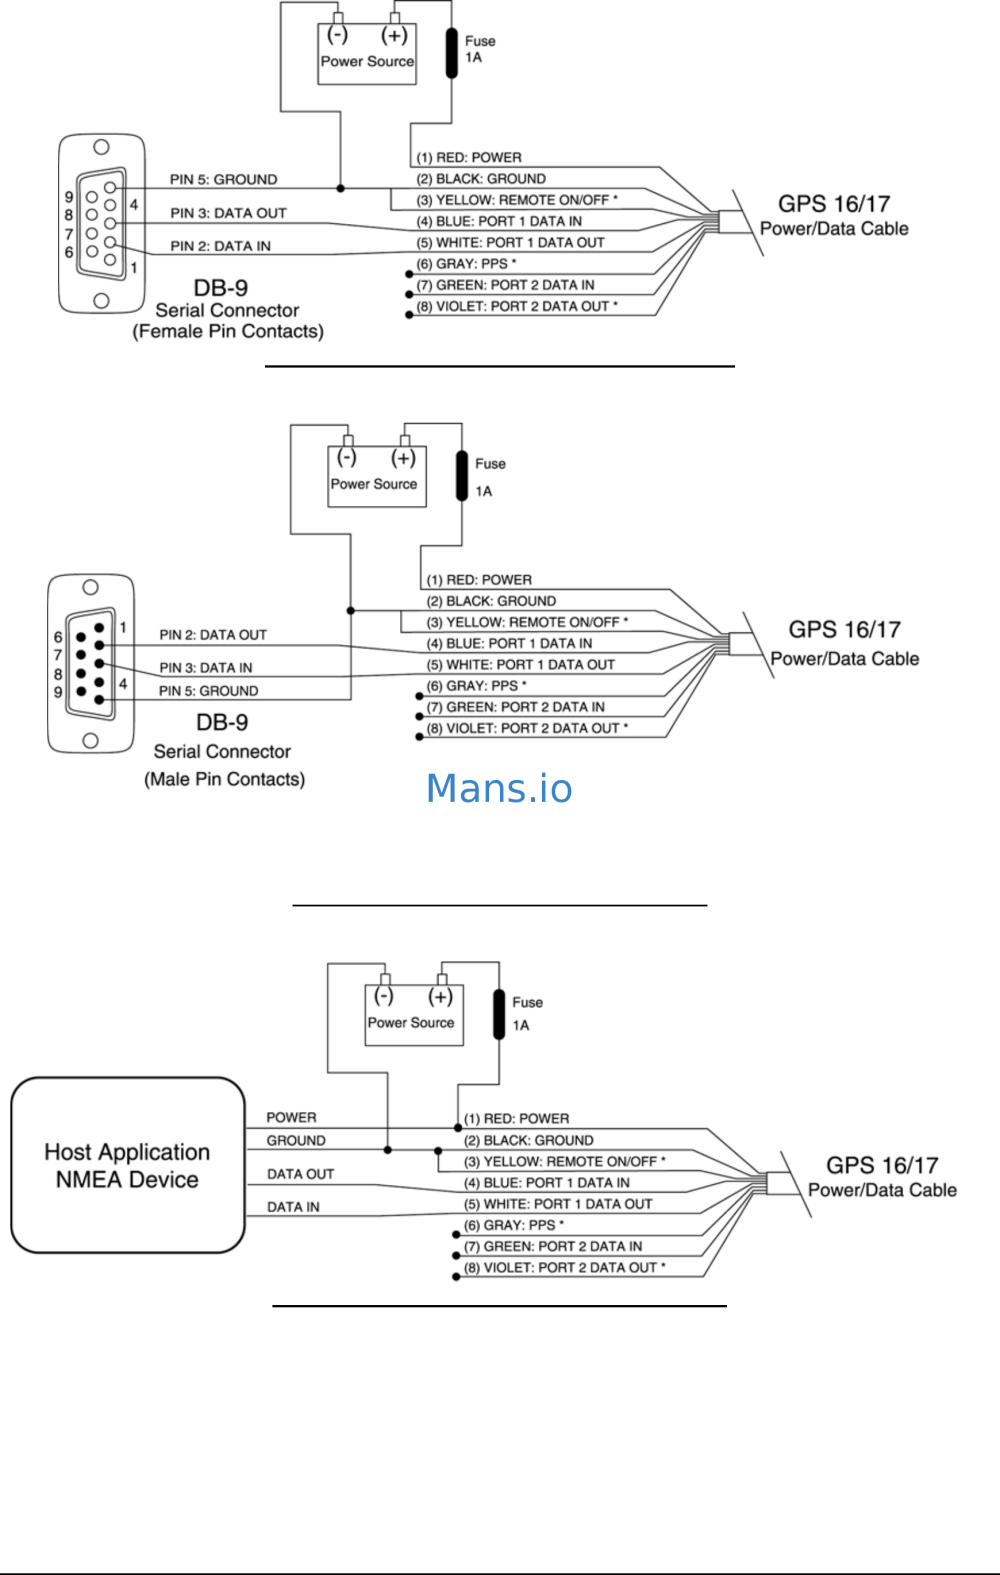 medium resolution of garmin 17 gps wiring diagram electrical wiring diagramgarmin 440 wiring diagram manual e bookgarmin gps 17